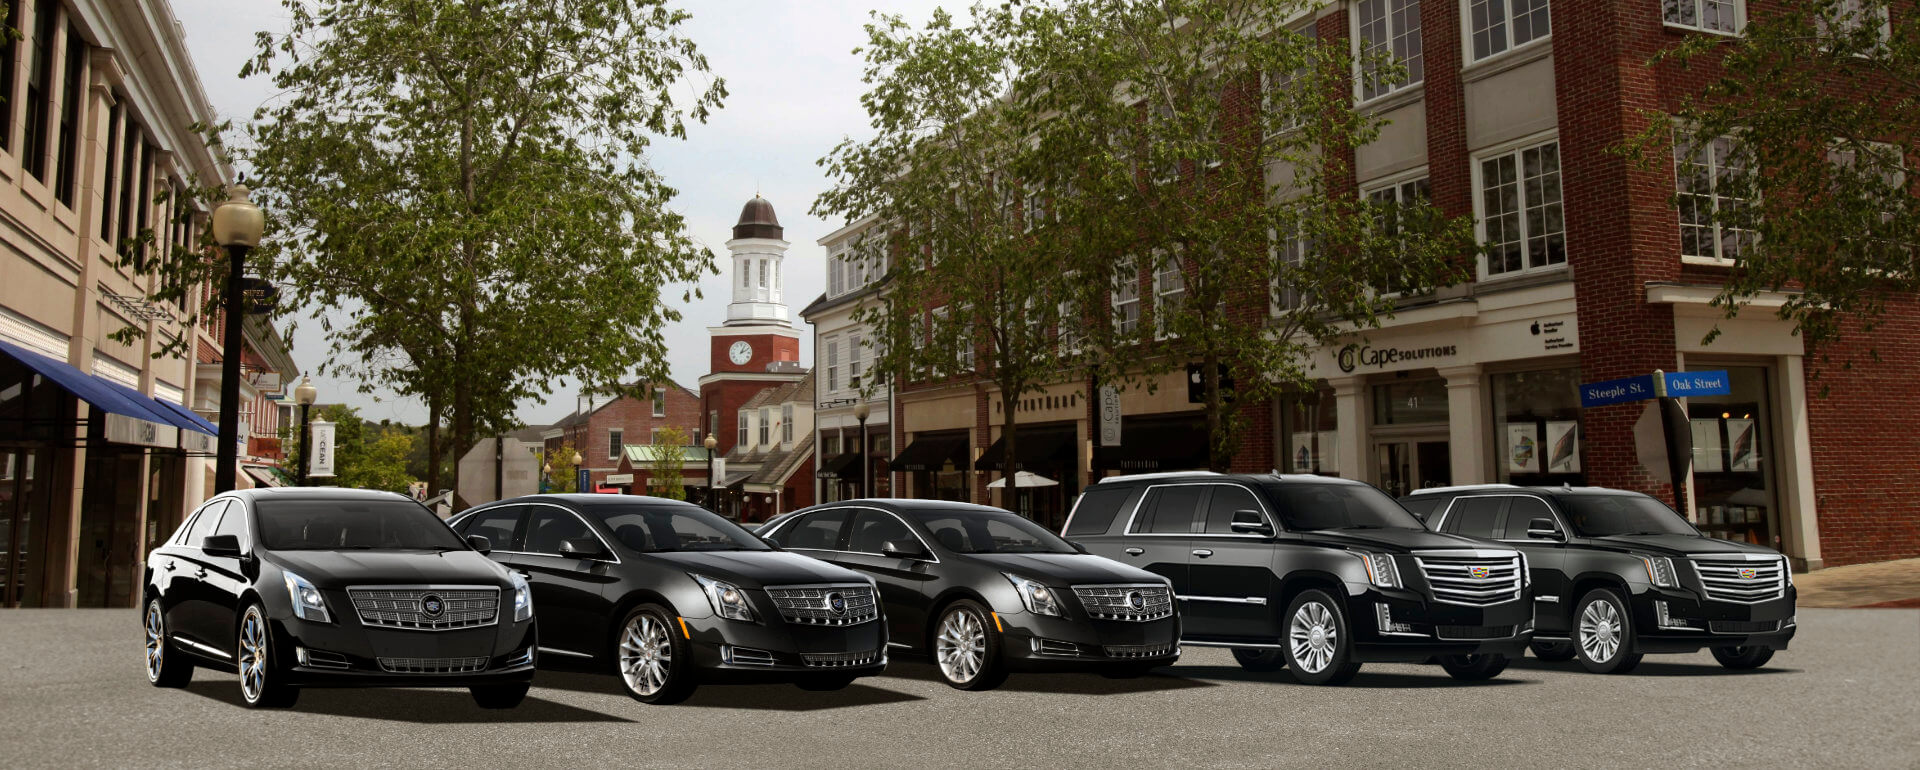 Boston car services